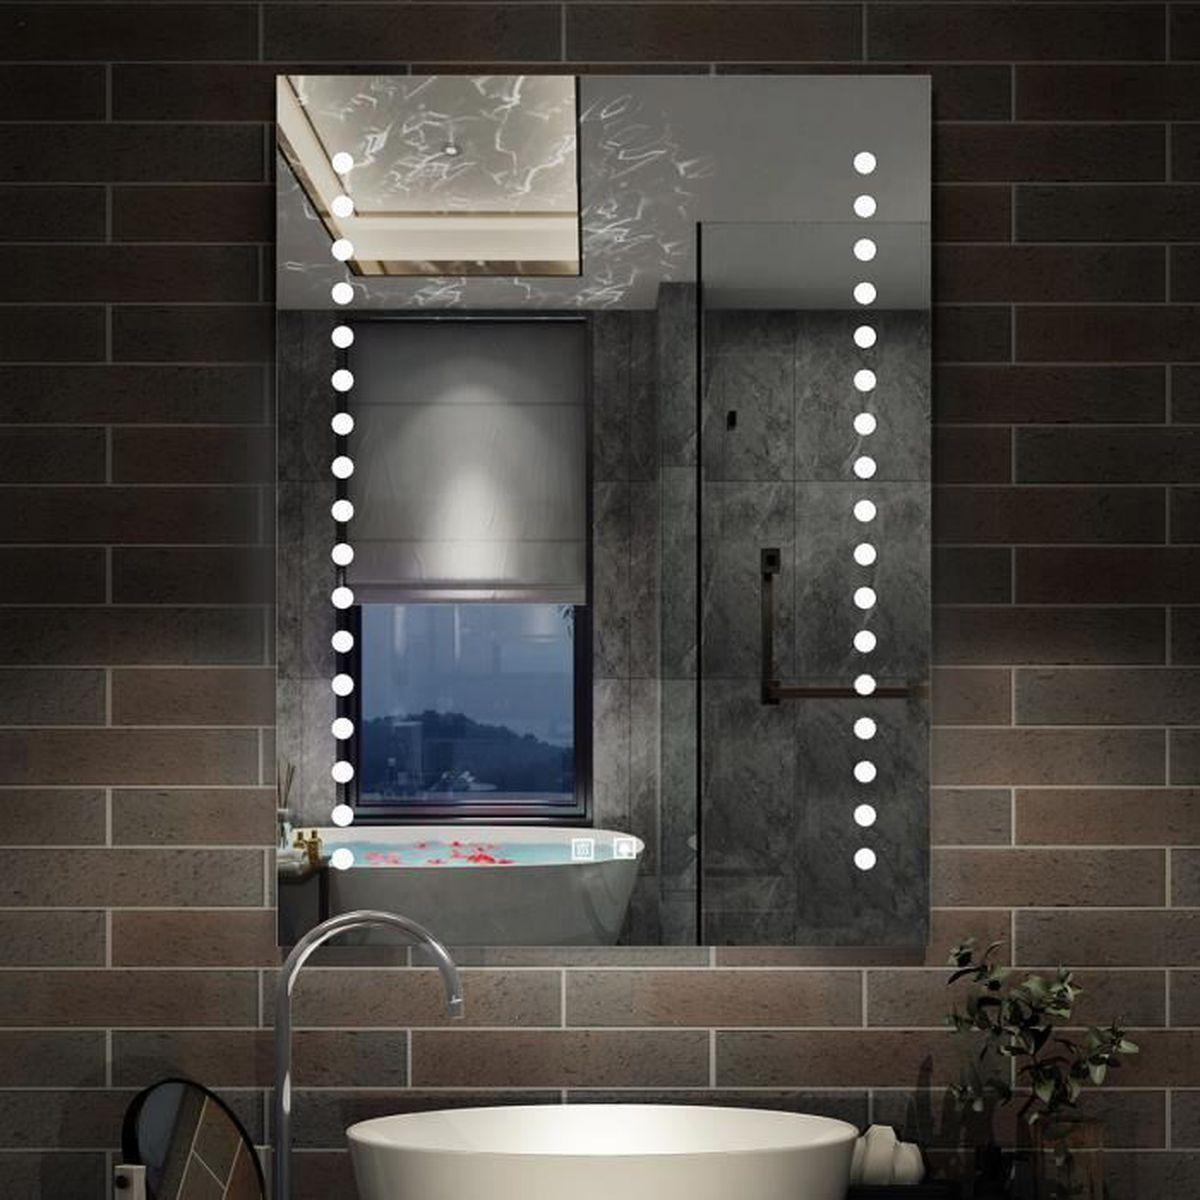 Miroir LED miroir de salle de bain Miroir lumineux 17x17cm anti